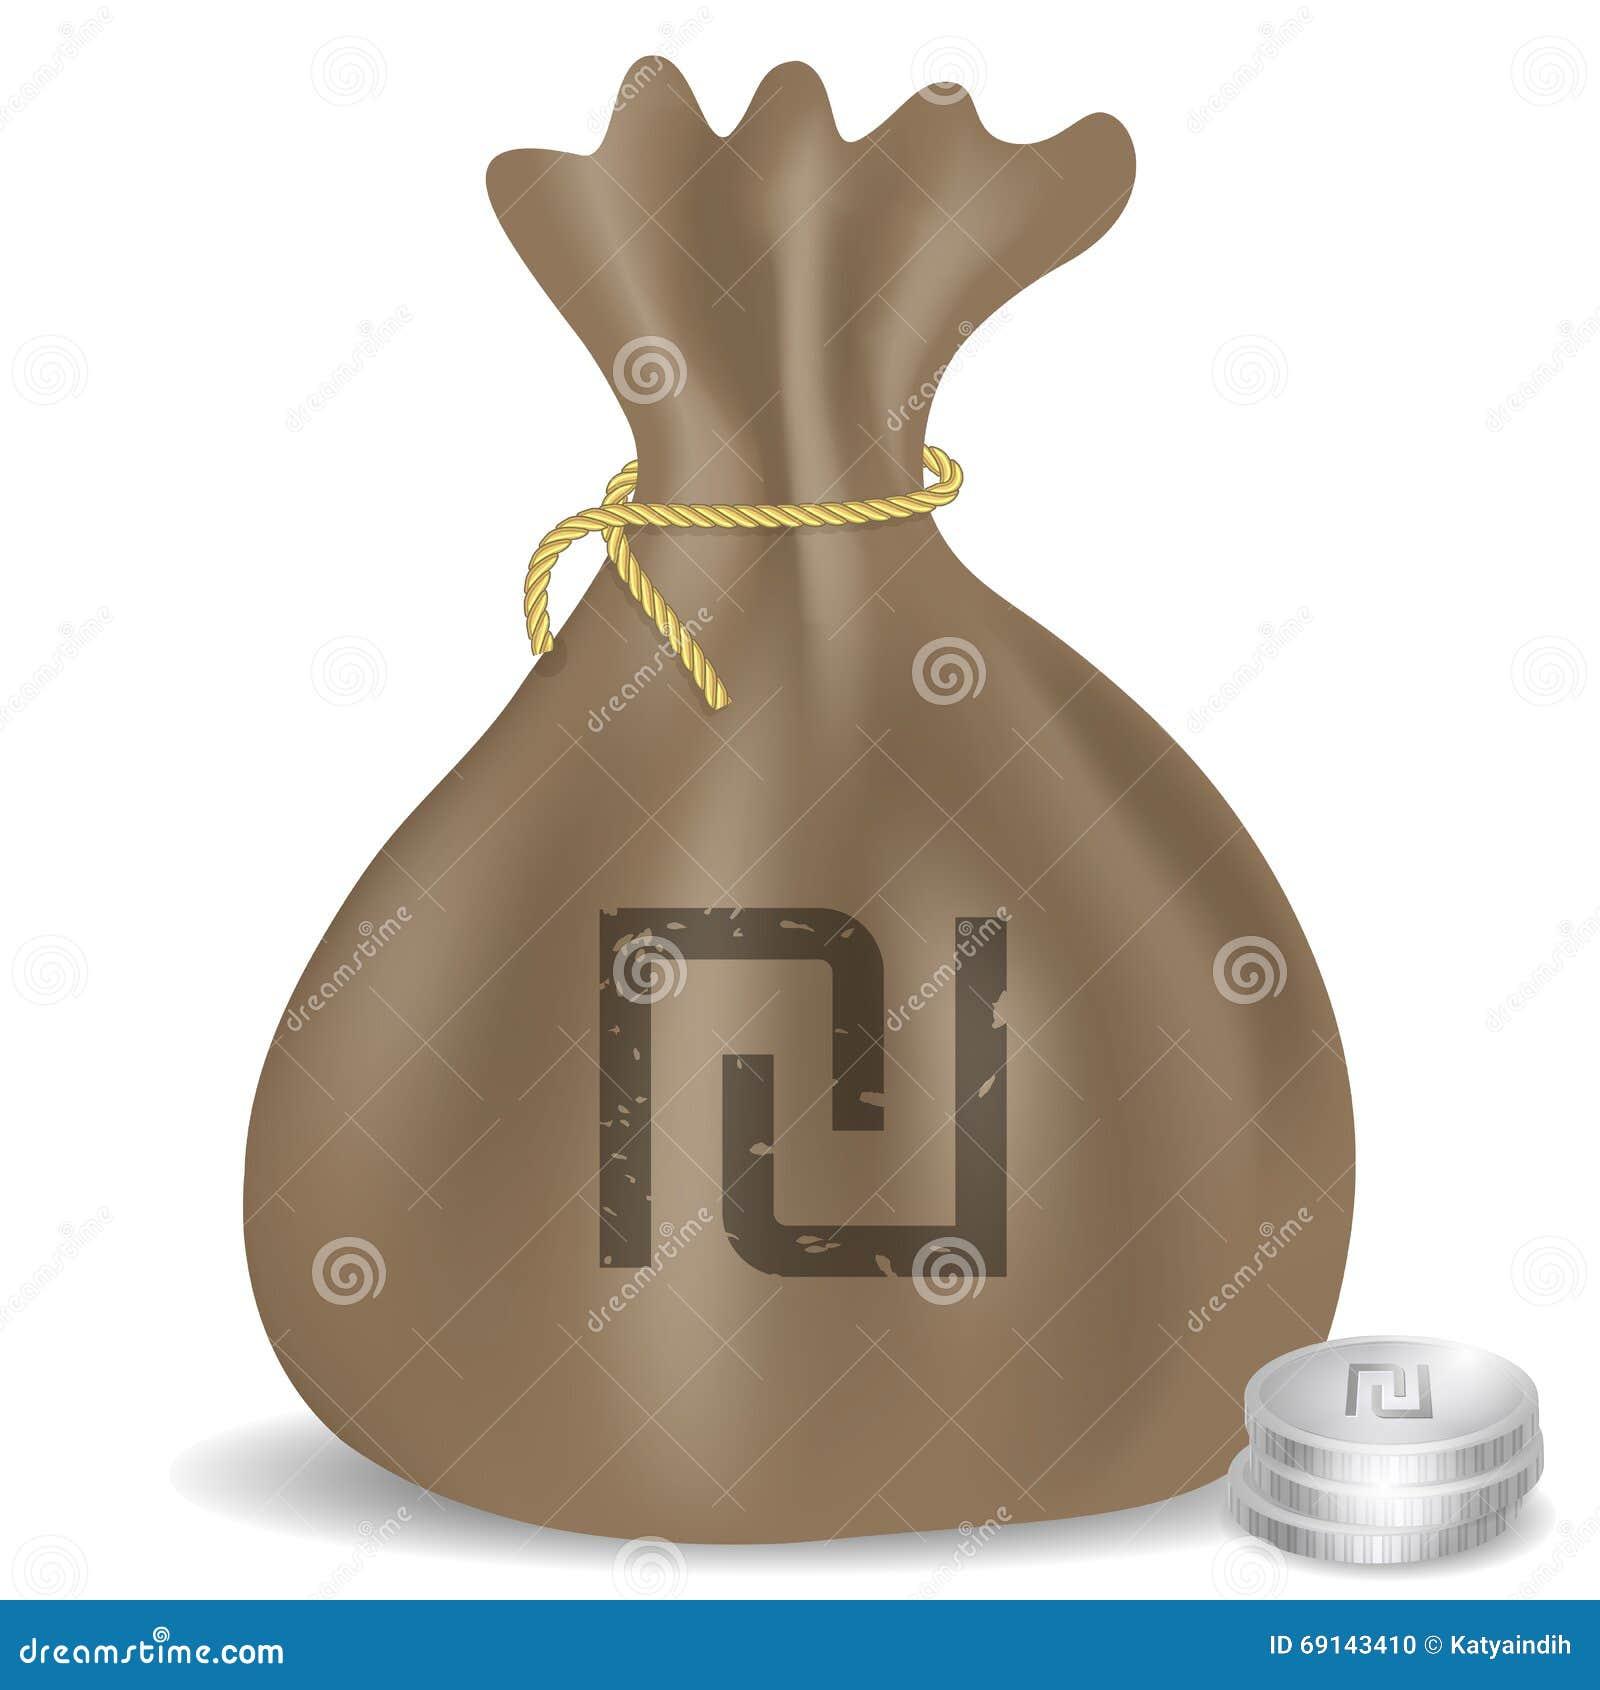 Money Bag Icon With Israeli Shekel Symbol Stock Vector